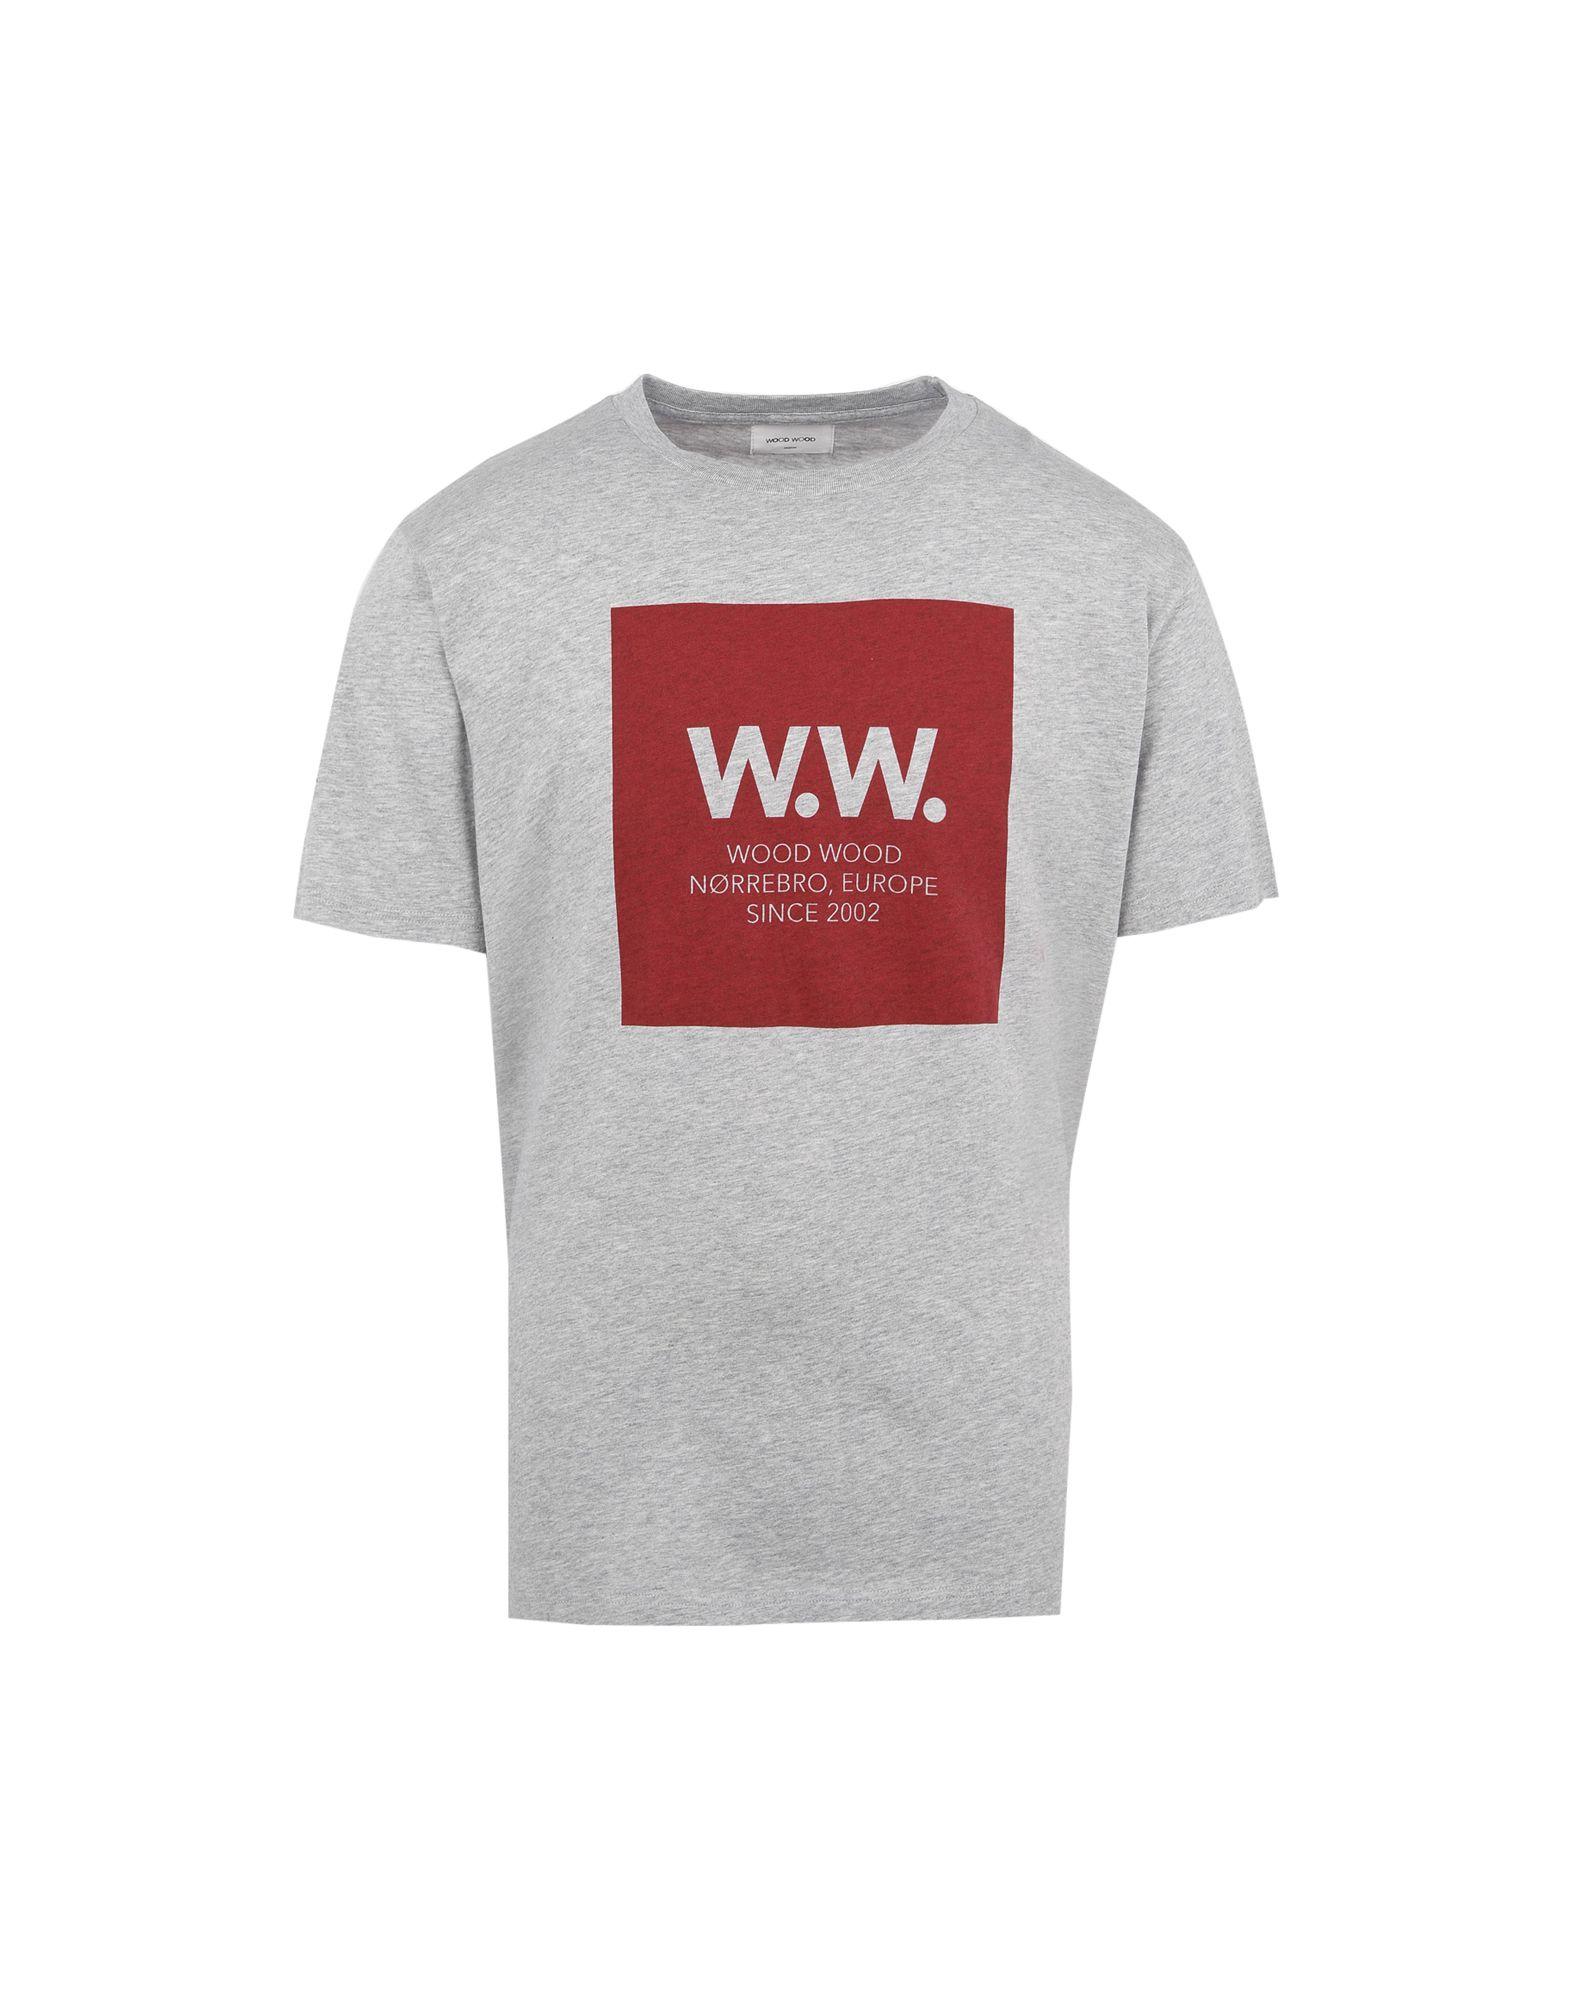 T-Shirt Wood Wood Ww Square T-Shirt Uomo Graphic T-Shirt - - T-Shirt Uomo - 12168136HB a87e58